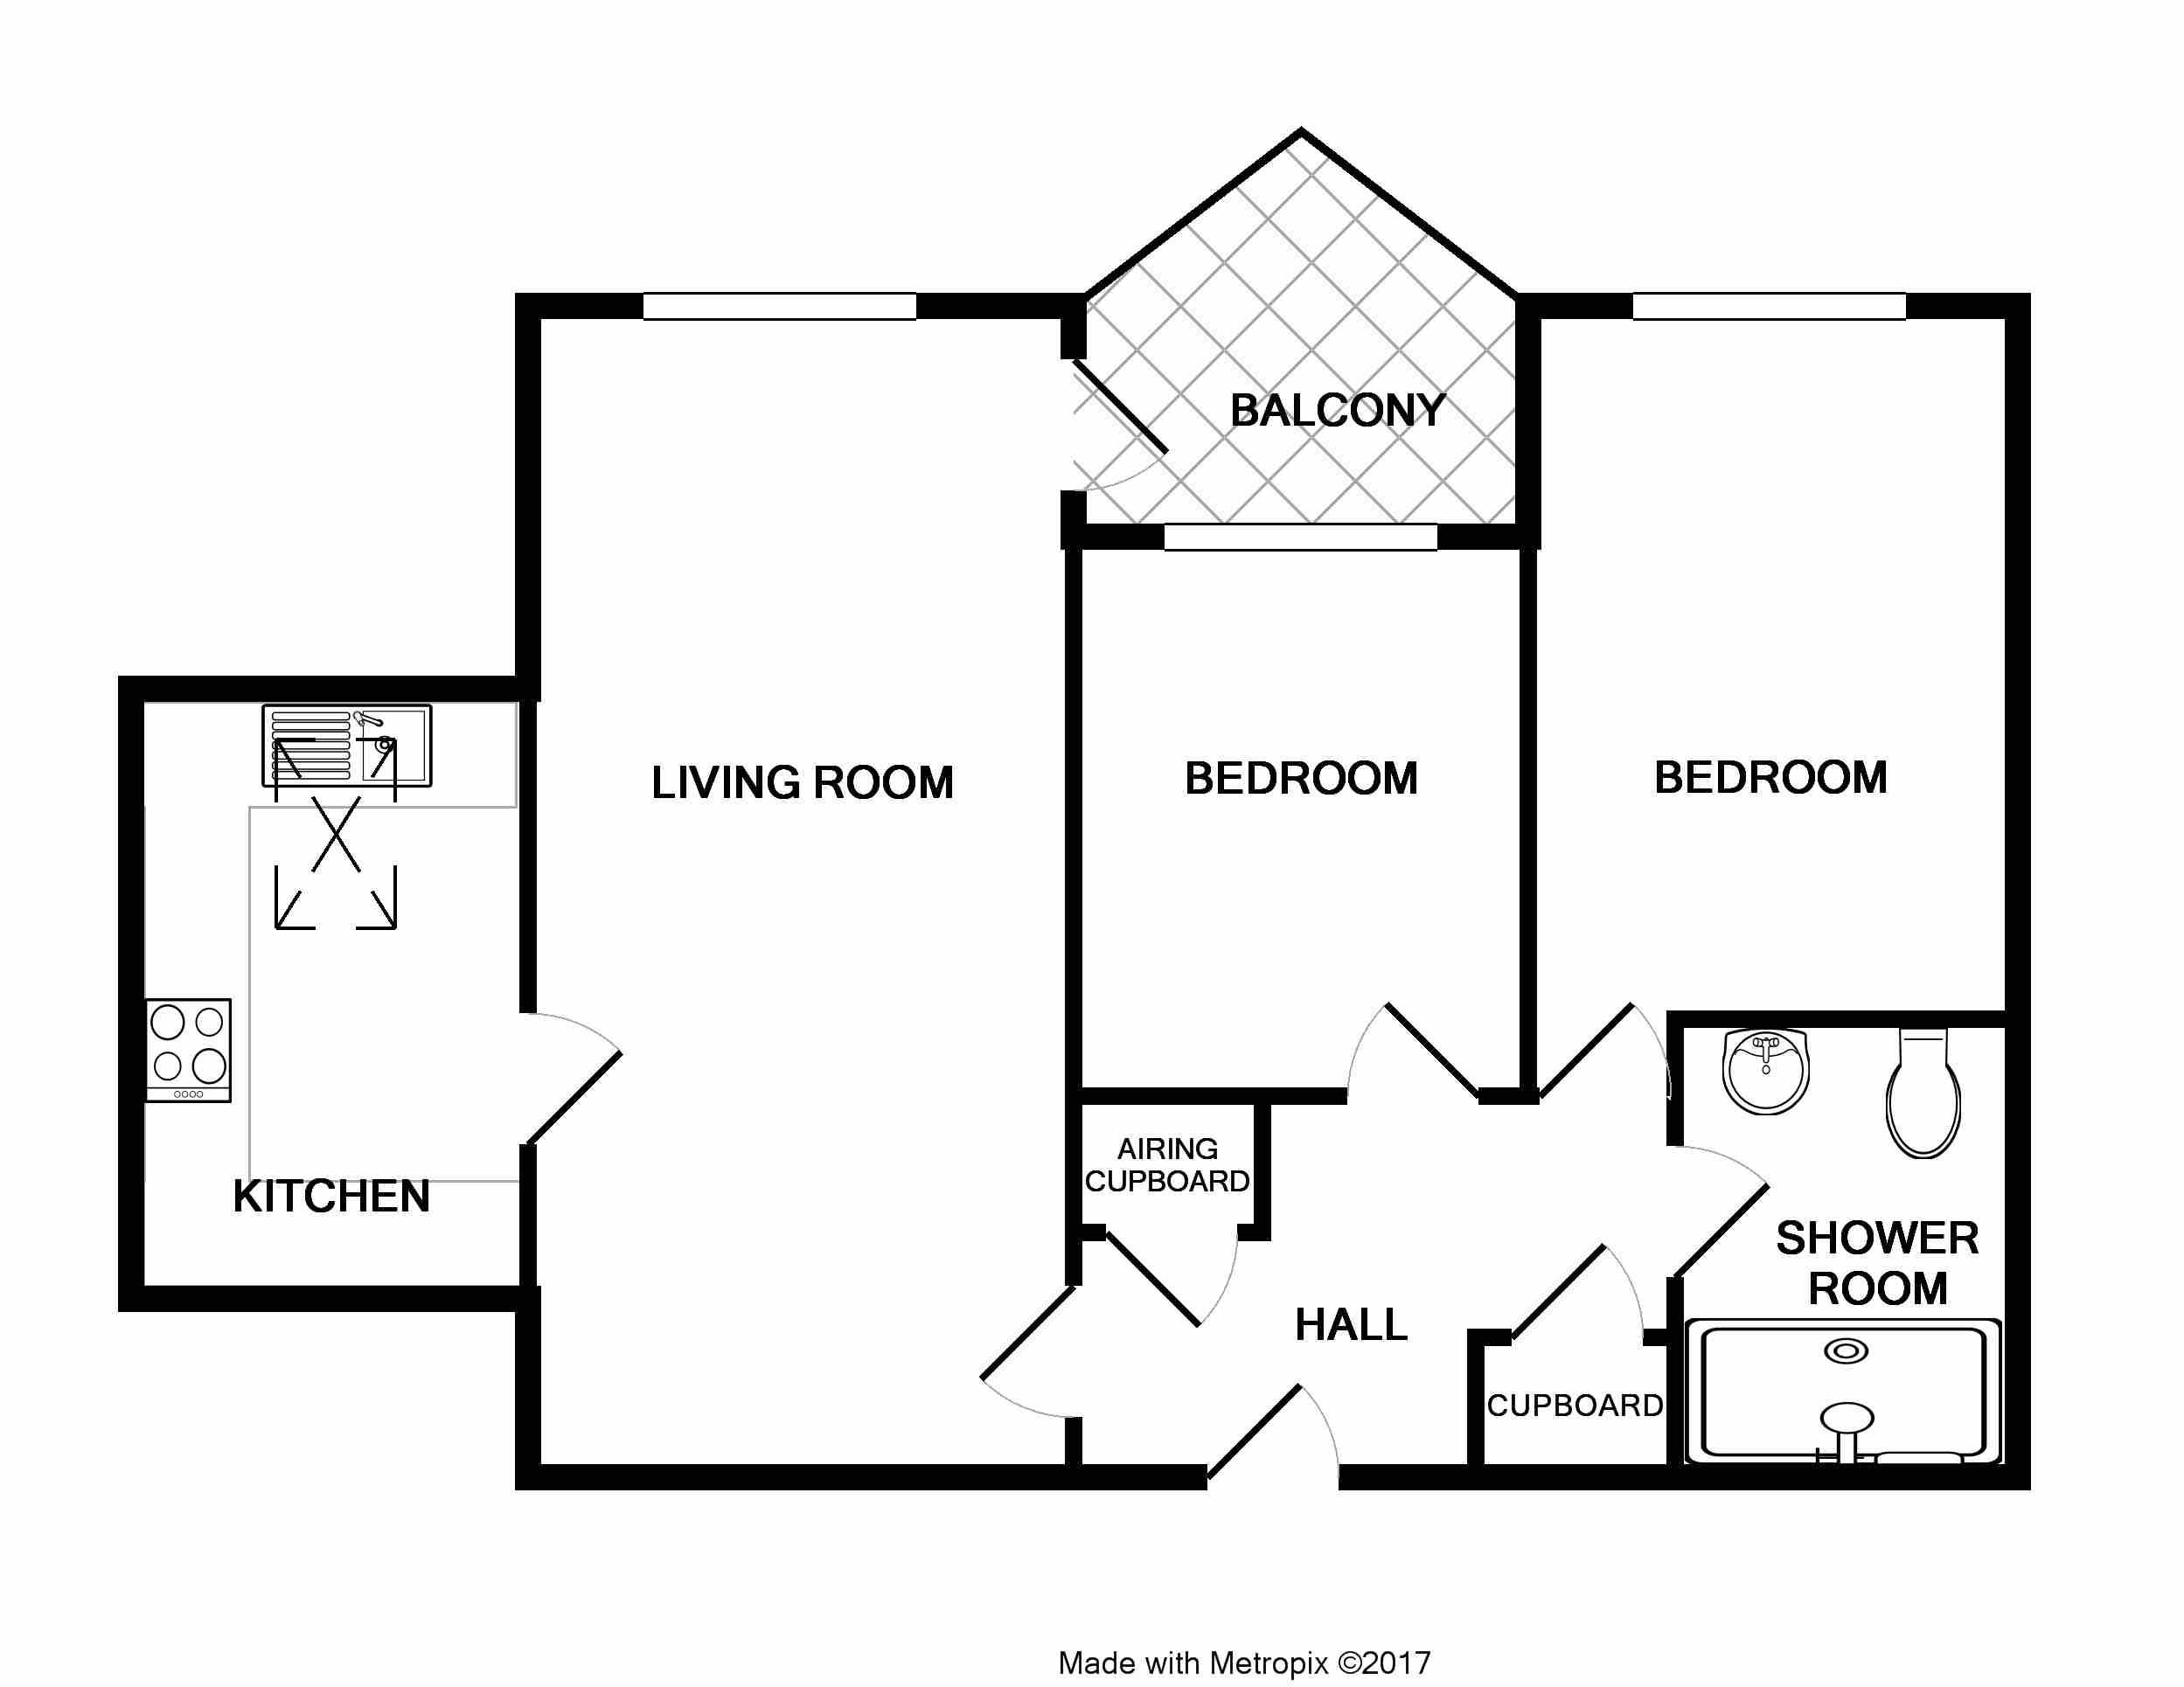 Bedroom Furniture For Sale Southend